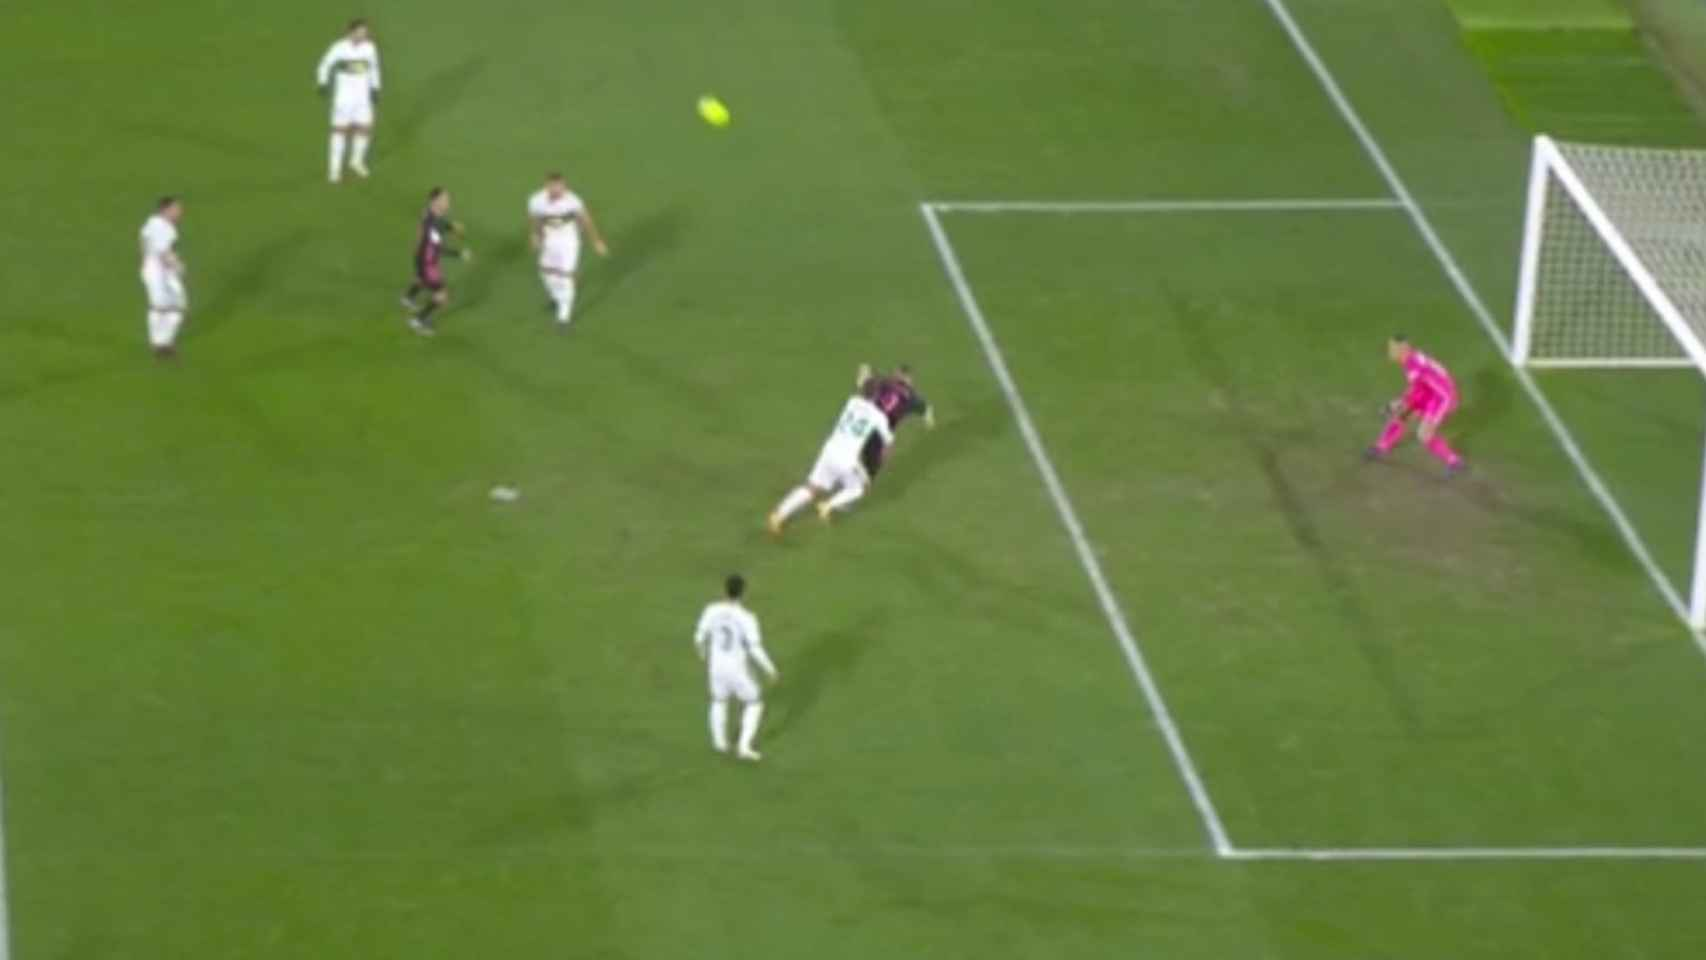 Penalti no pitado sobre Benzema